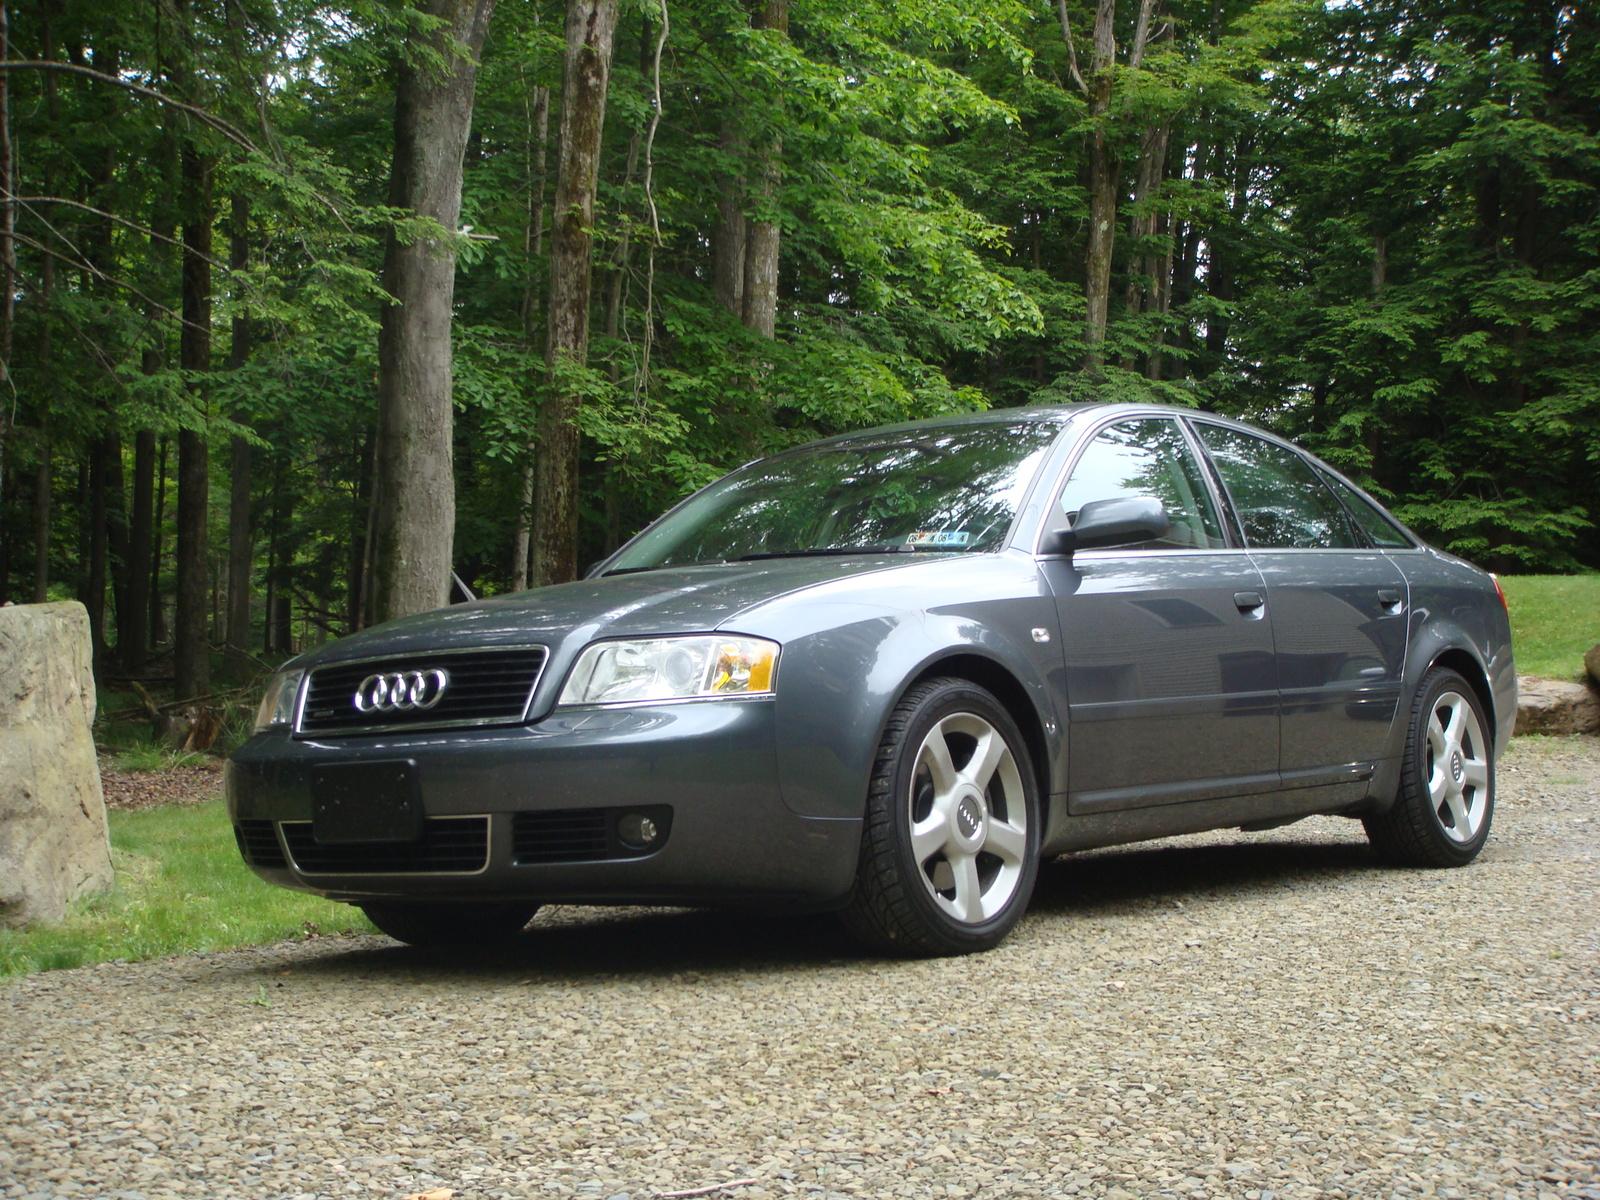 2004 Audi A6 Image 16